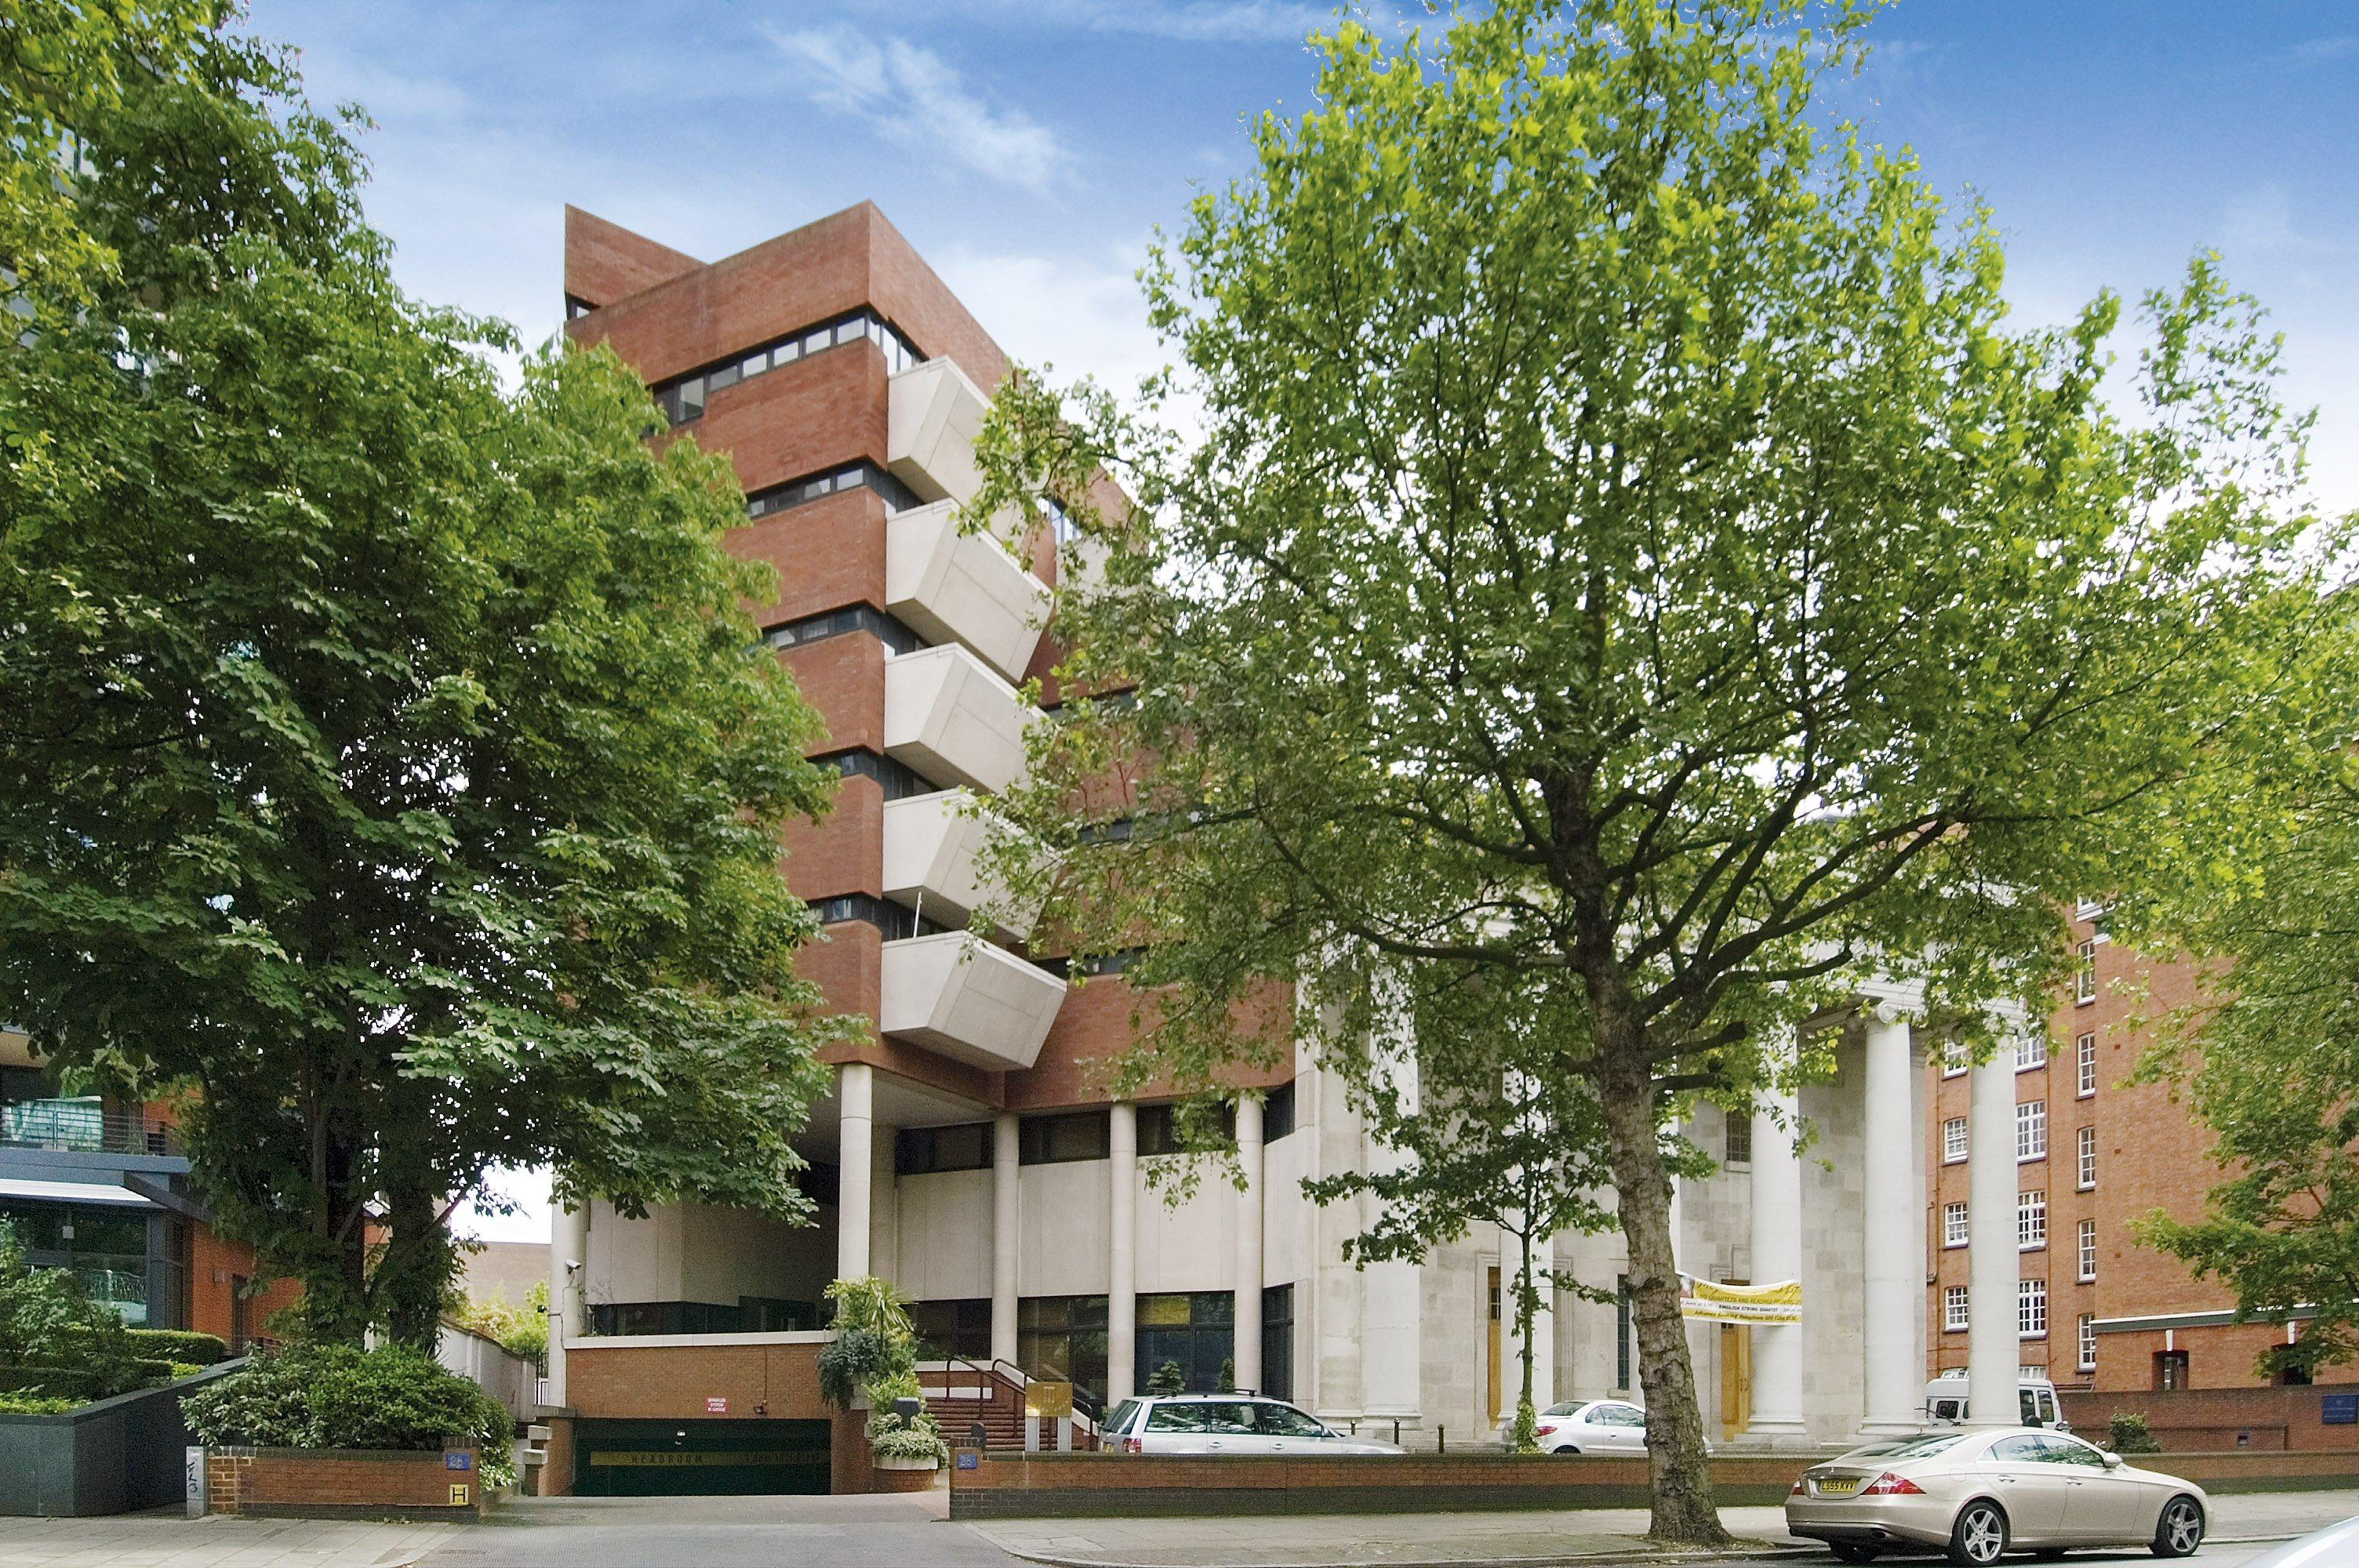 Blazer Court, St Johns Wood Road, London, NW8